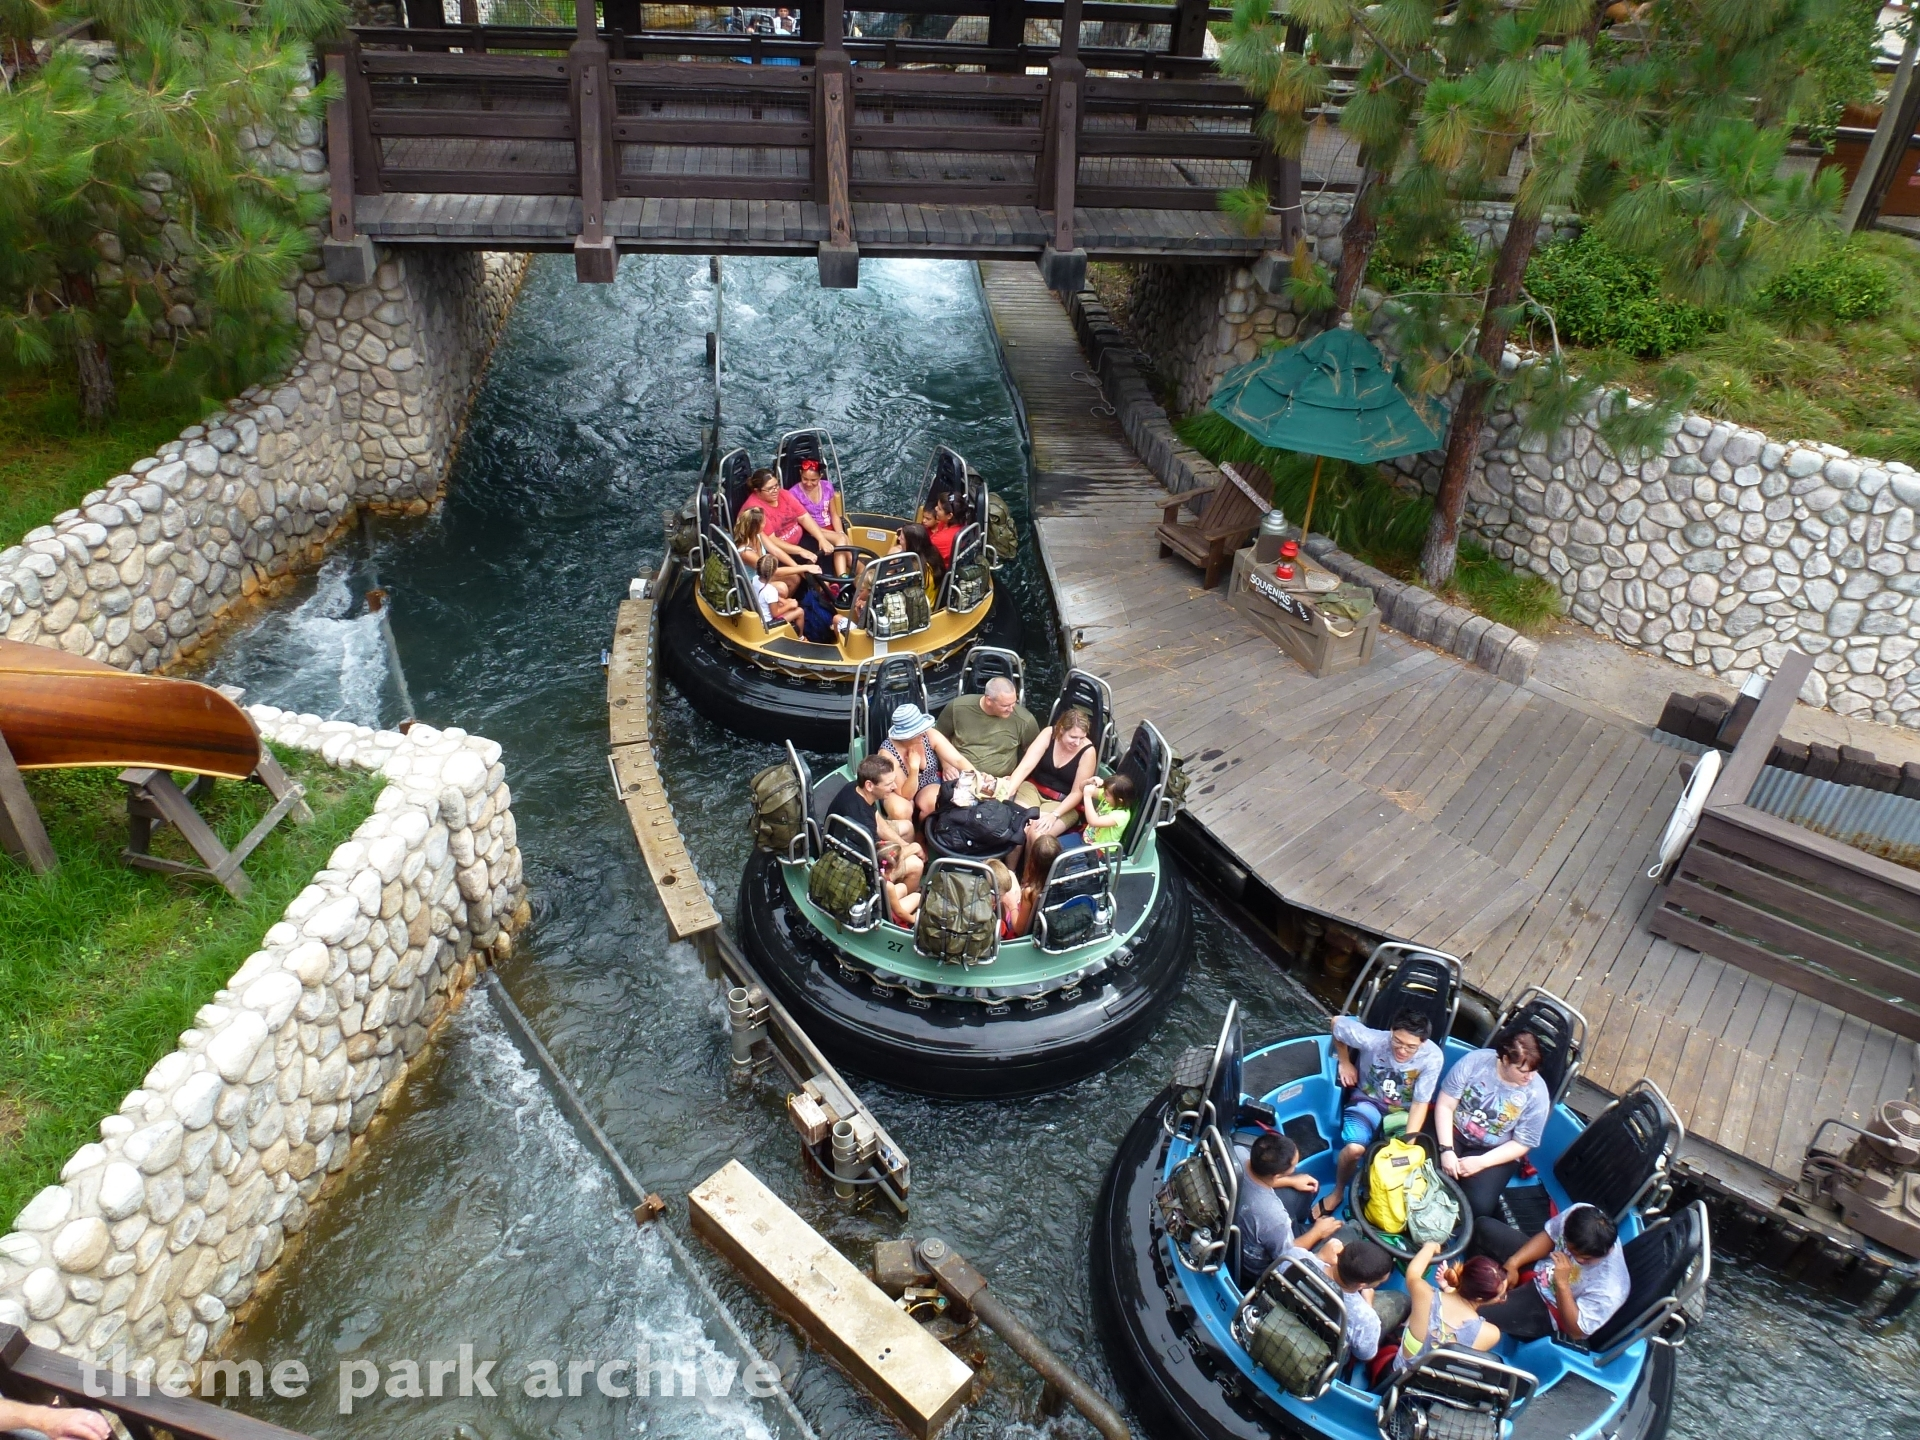 Grizzly River Run at Disney California Adventure